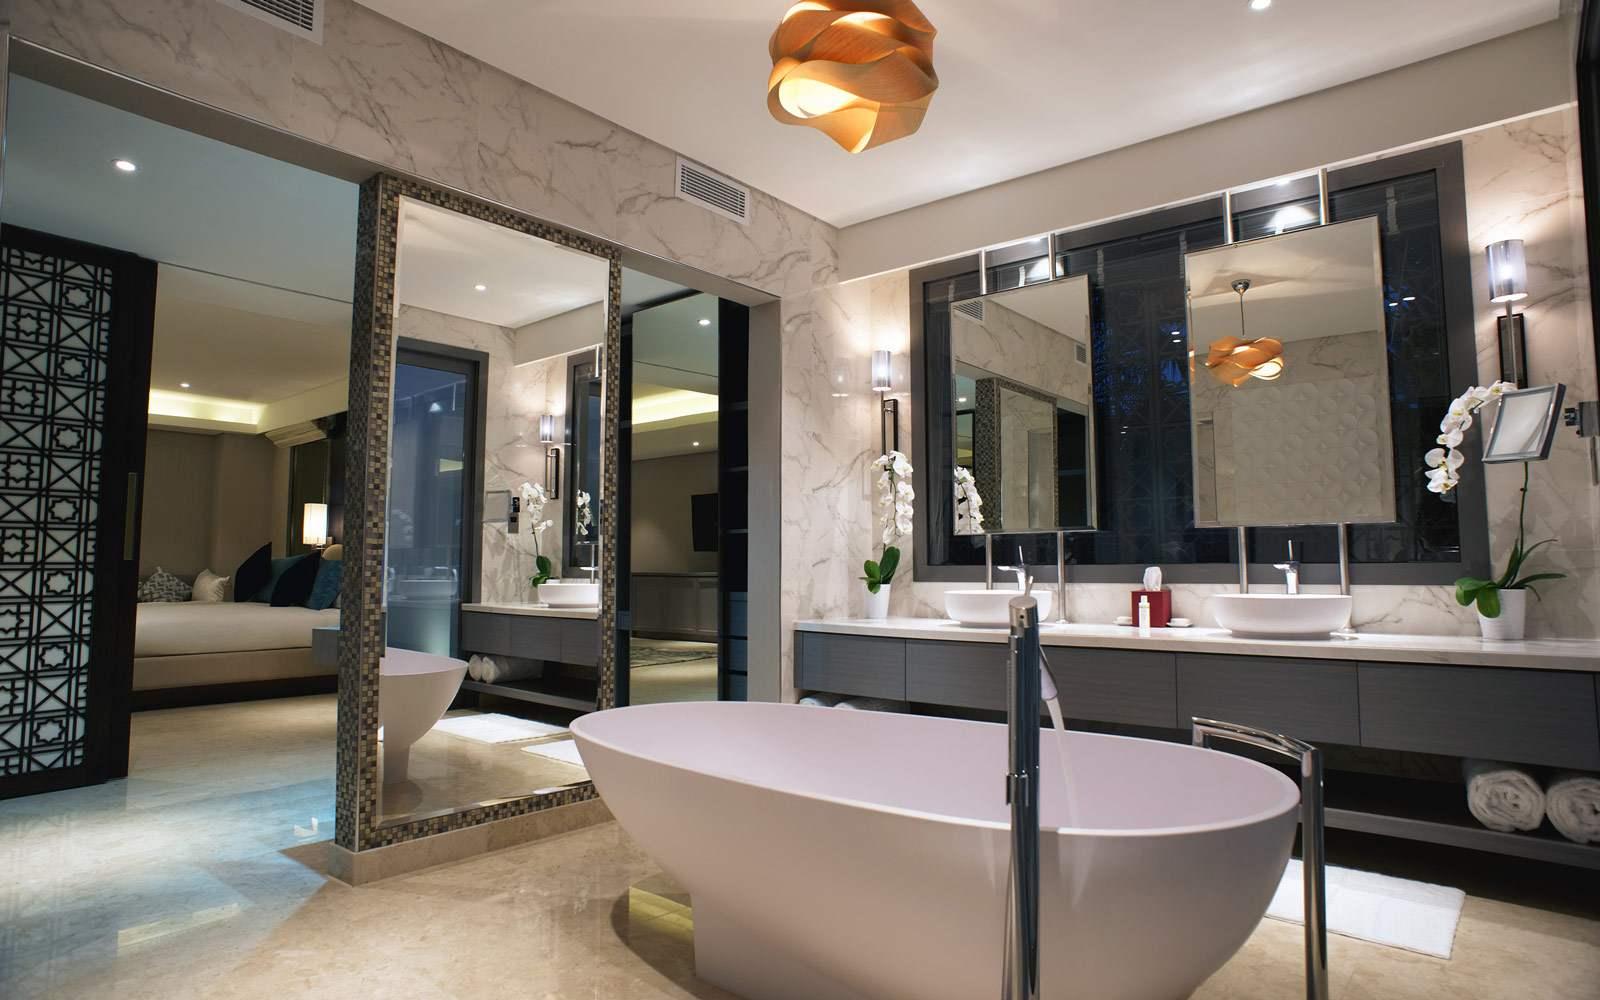 Melia Desert Villa Layali Bathroom